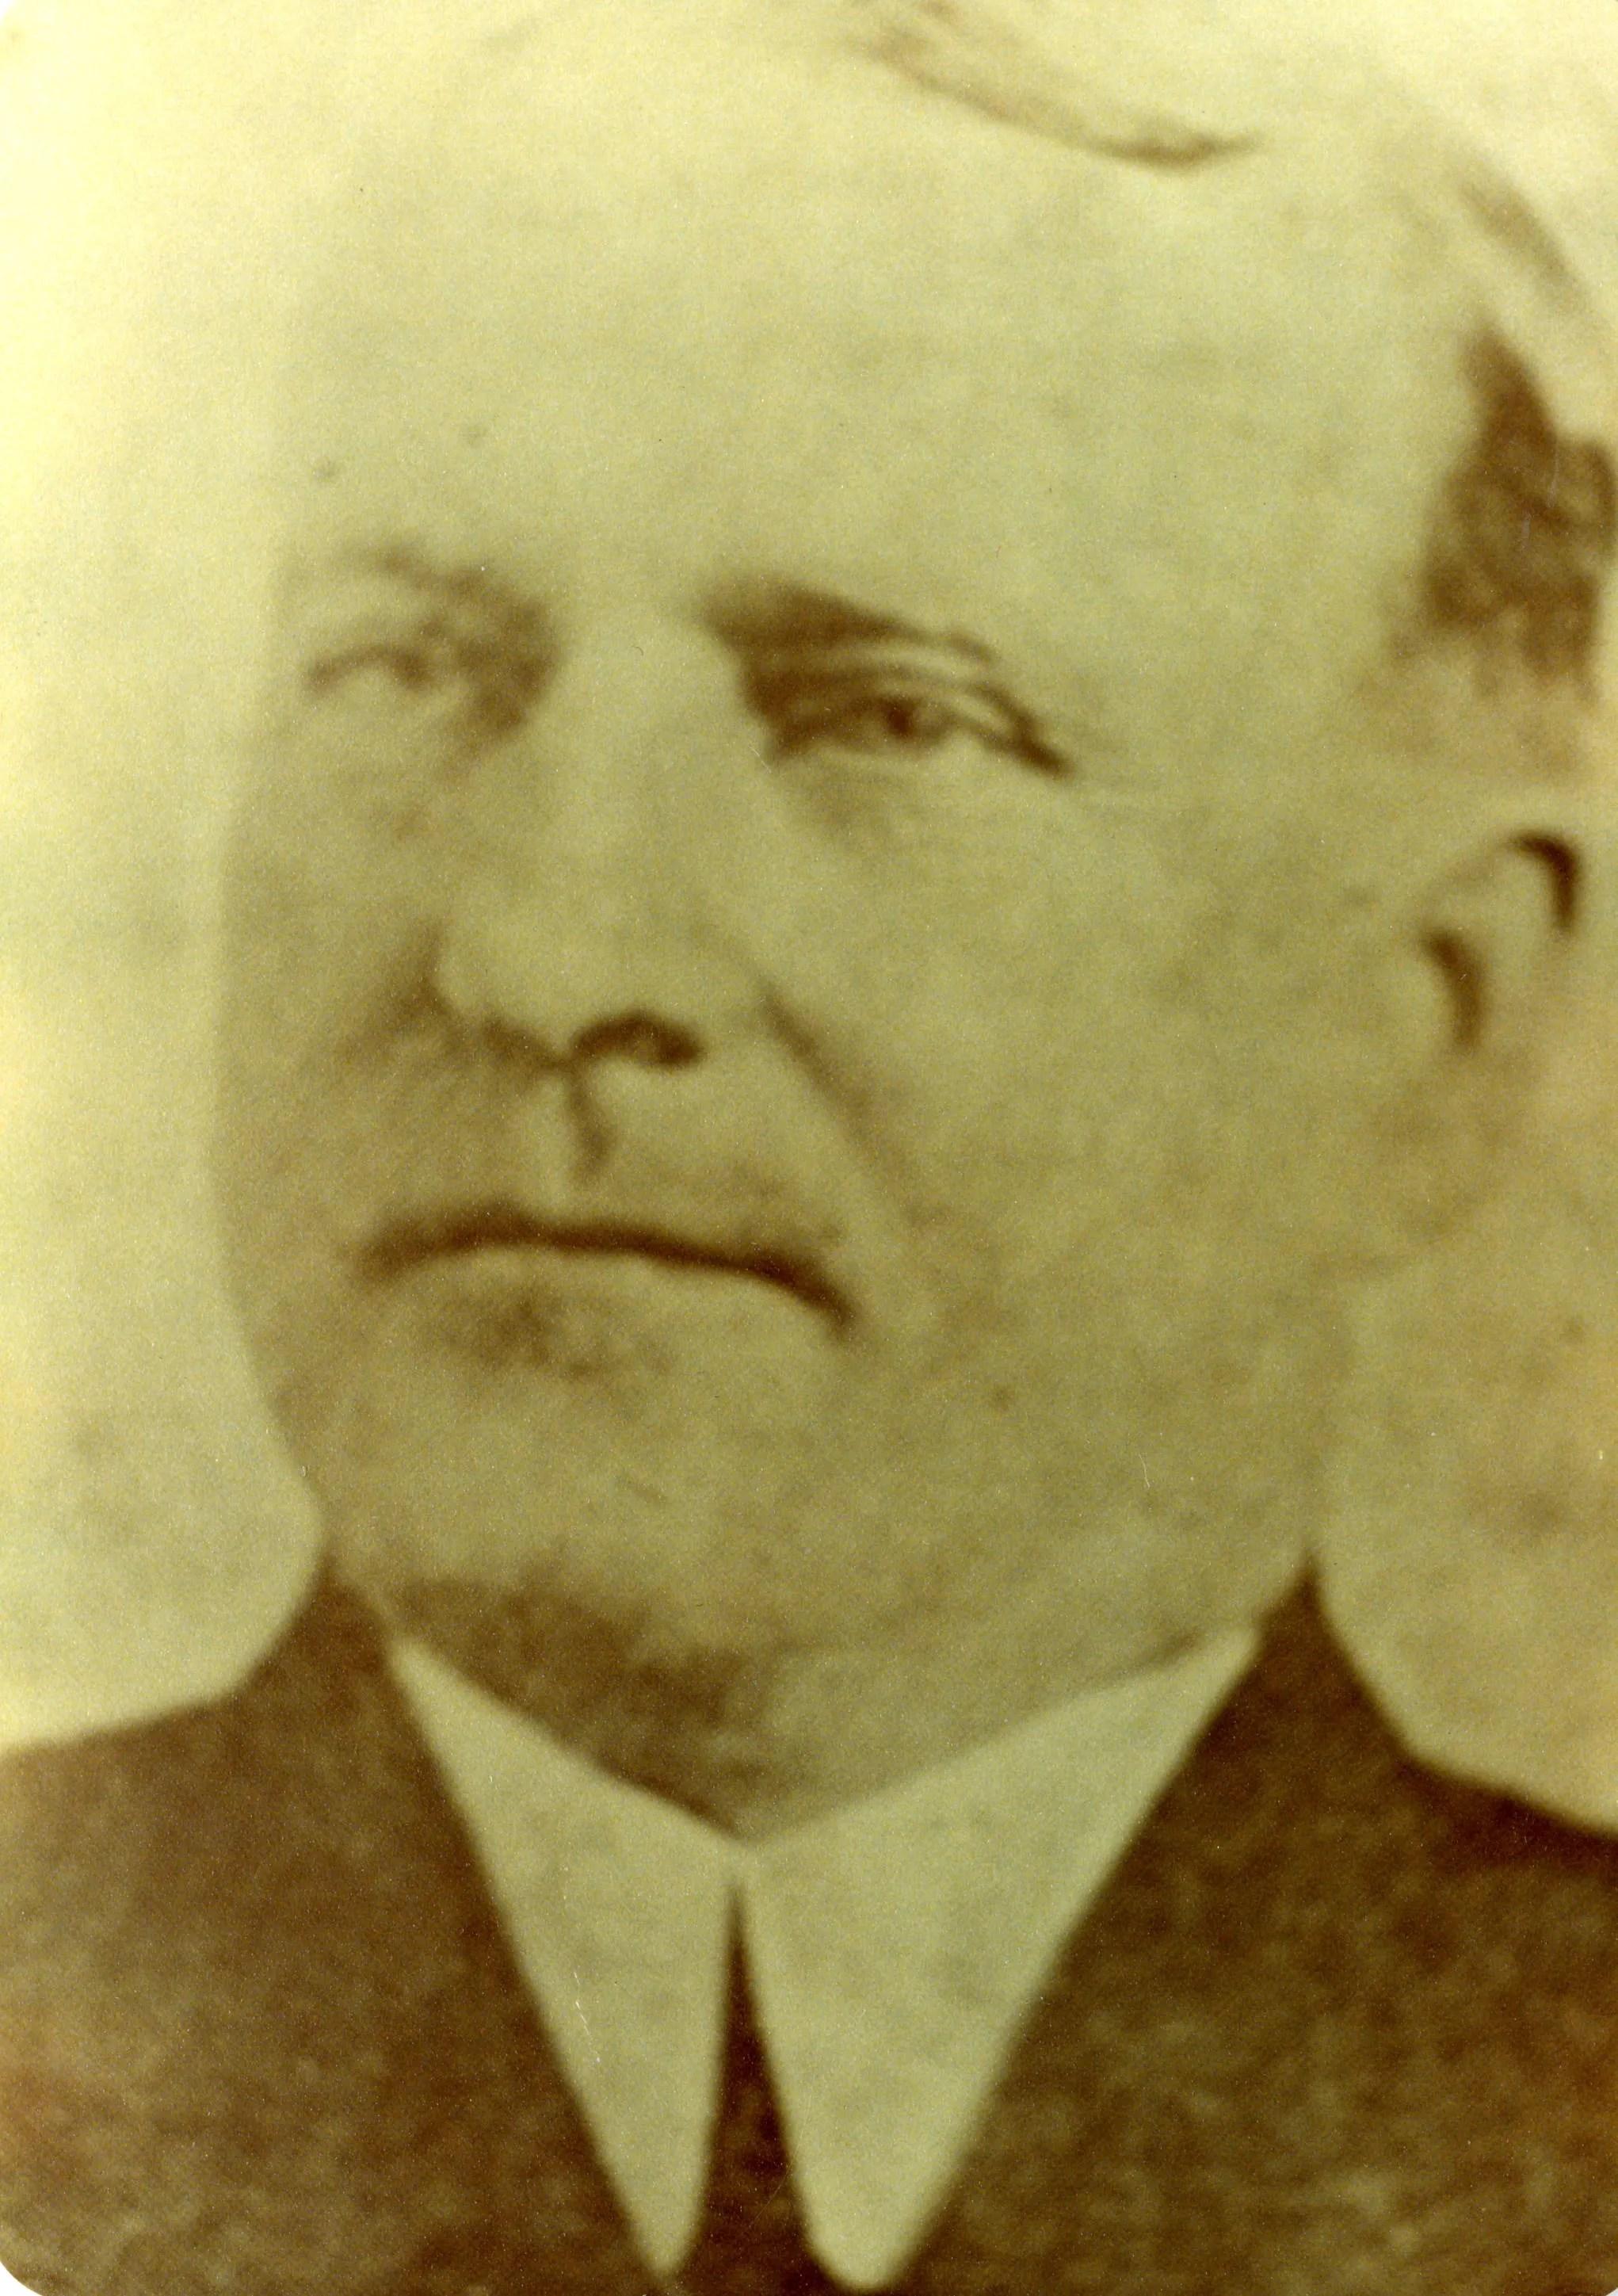 1cfd385f 0ff7 4908 abf3 0bb6759b9a5b W. Tate Brady credit to Ruth Sigler Avery Collection Tulsa Race Massacre of 1921 OSU Tulsa Archives